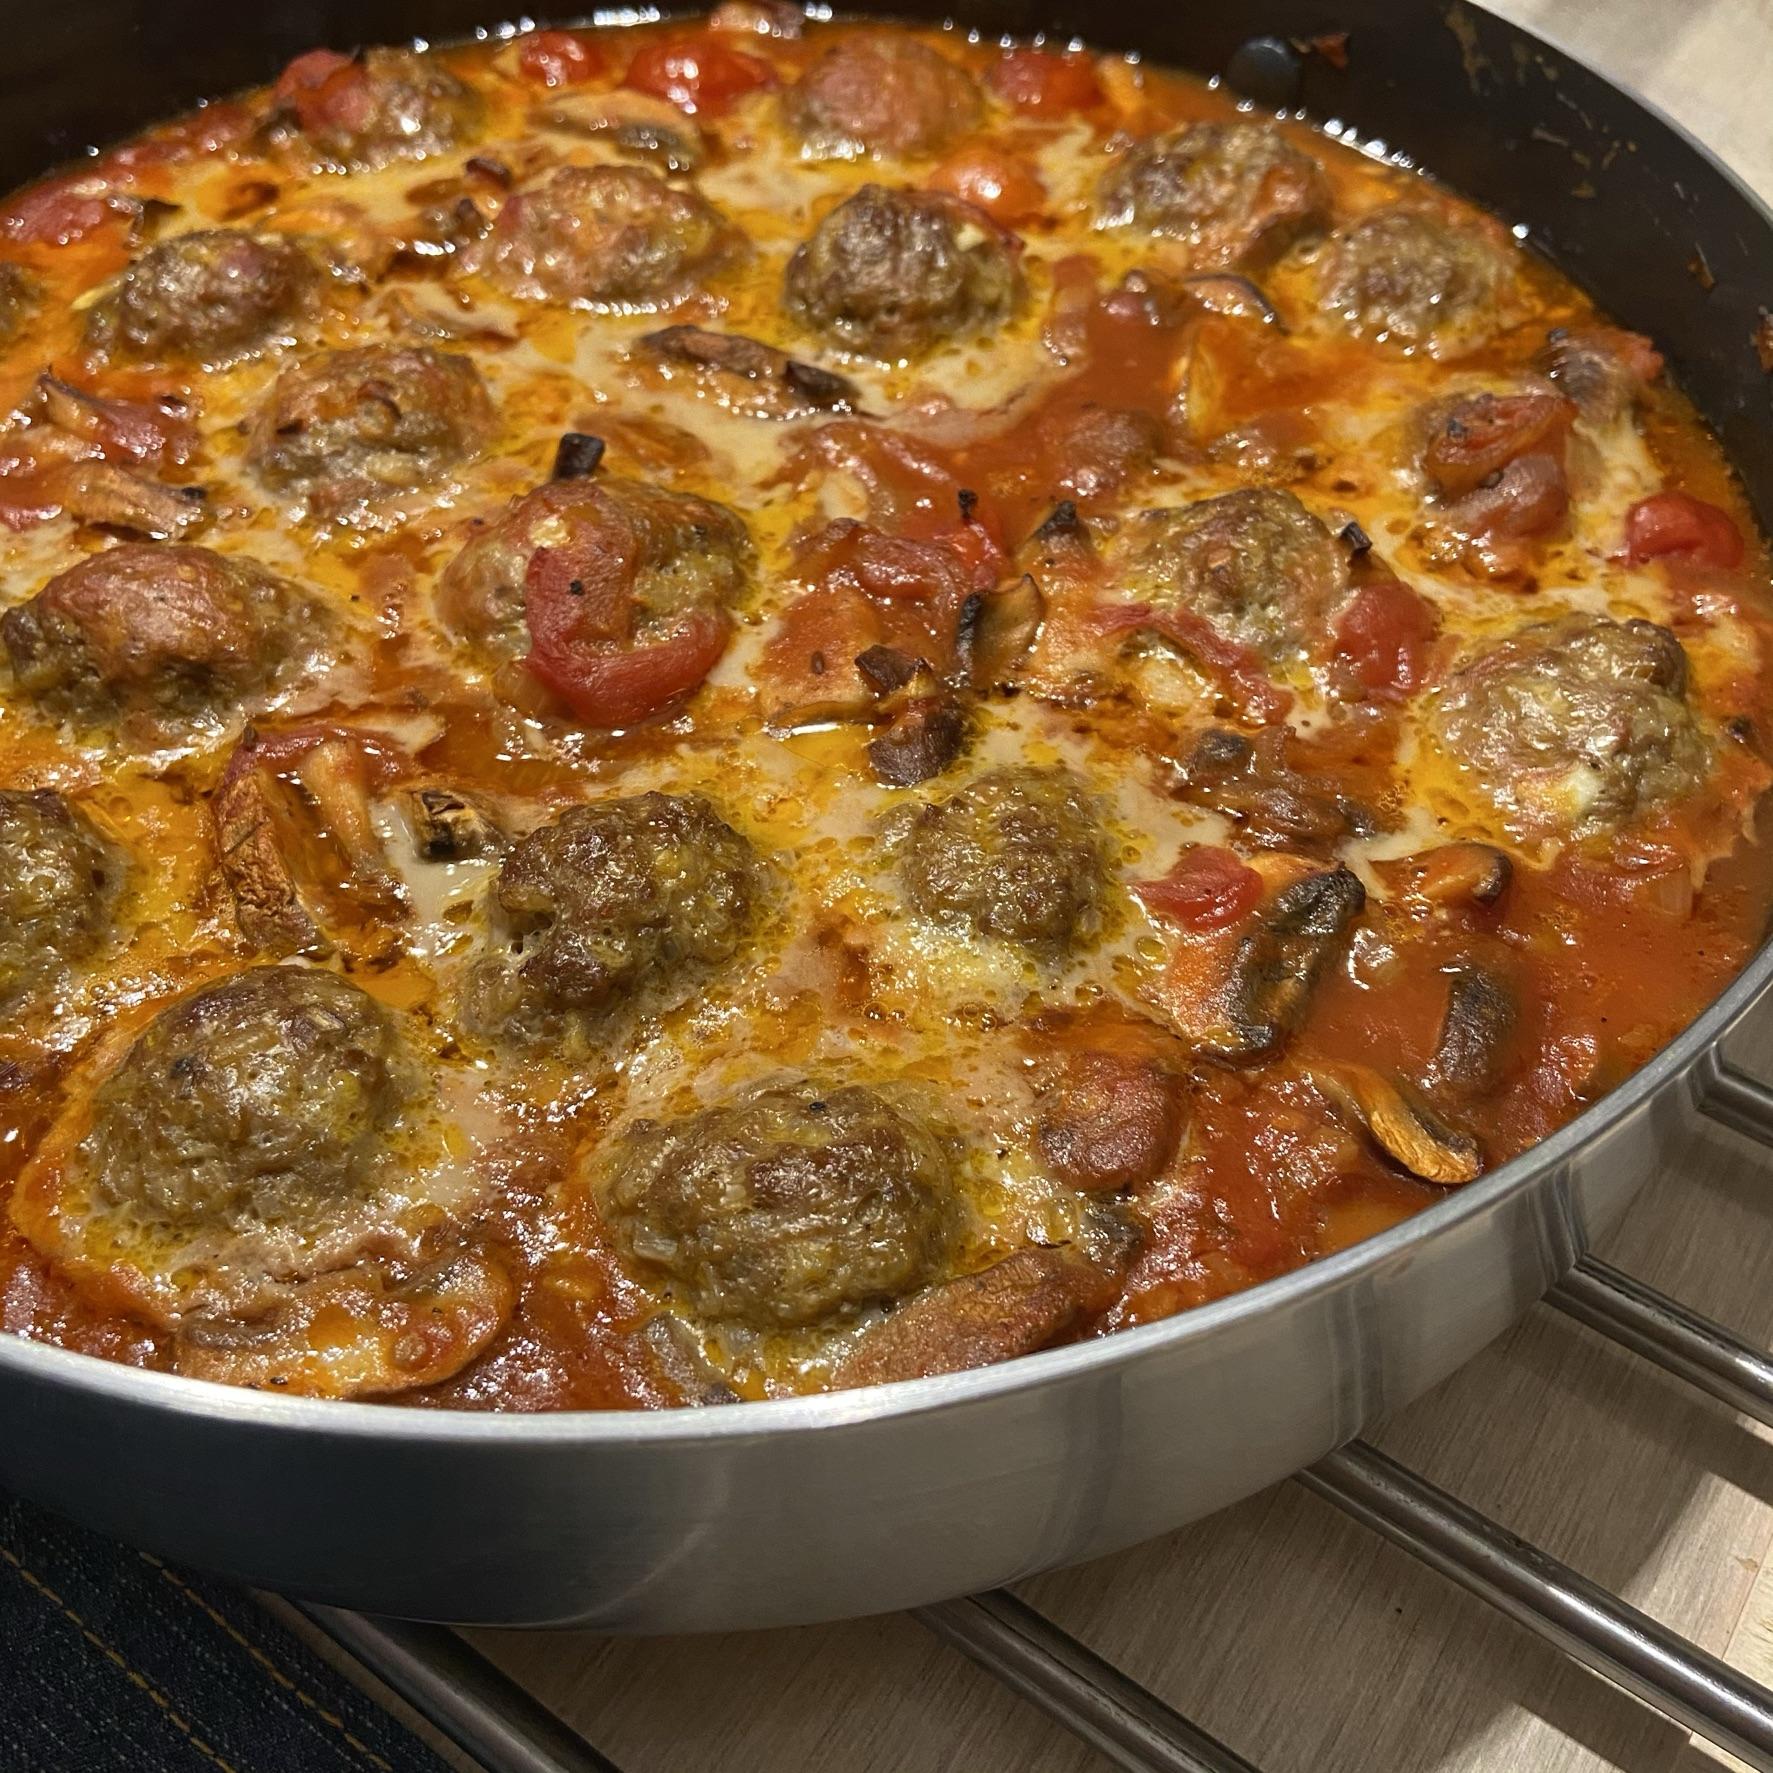 Pittige rundergehakt-zilvervliesrijstballetjes in tomaten-champignonsaus